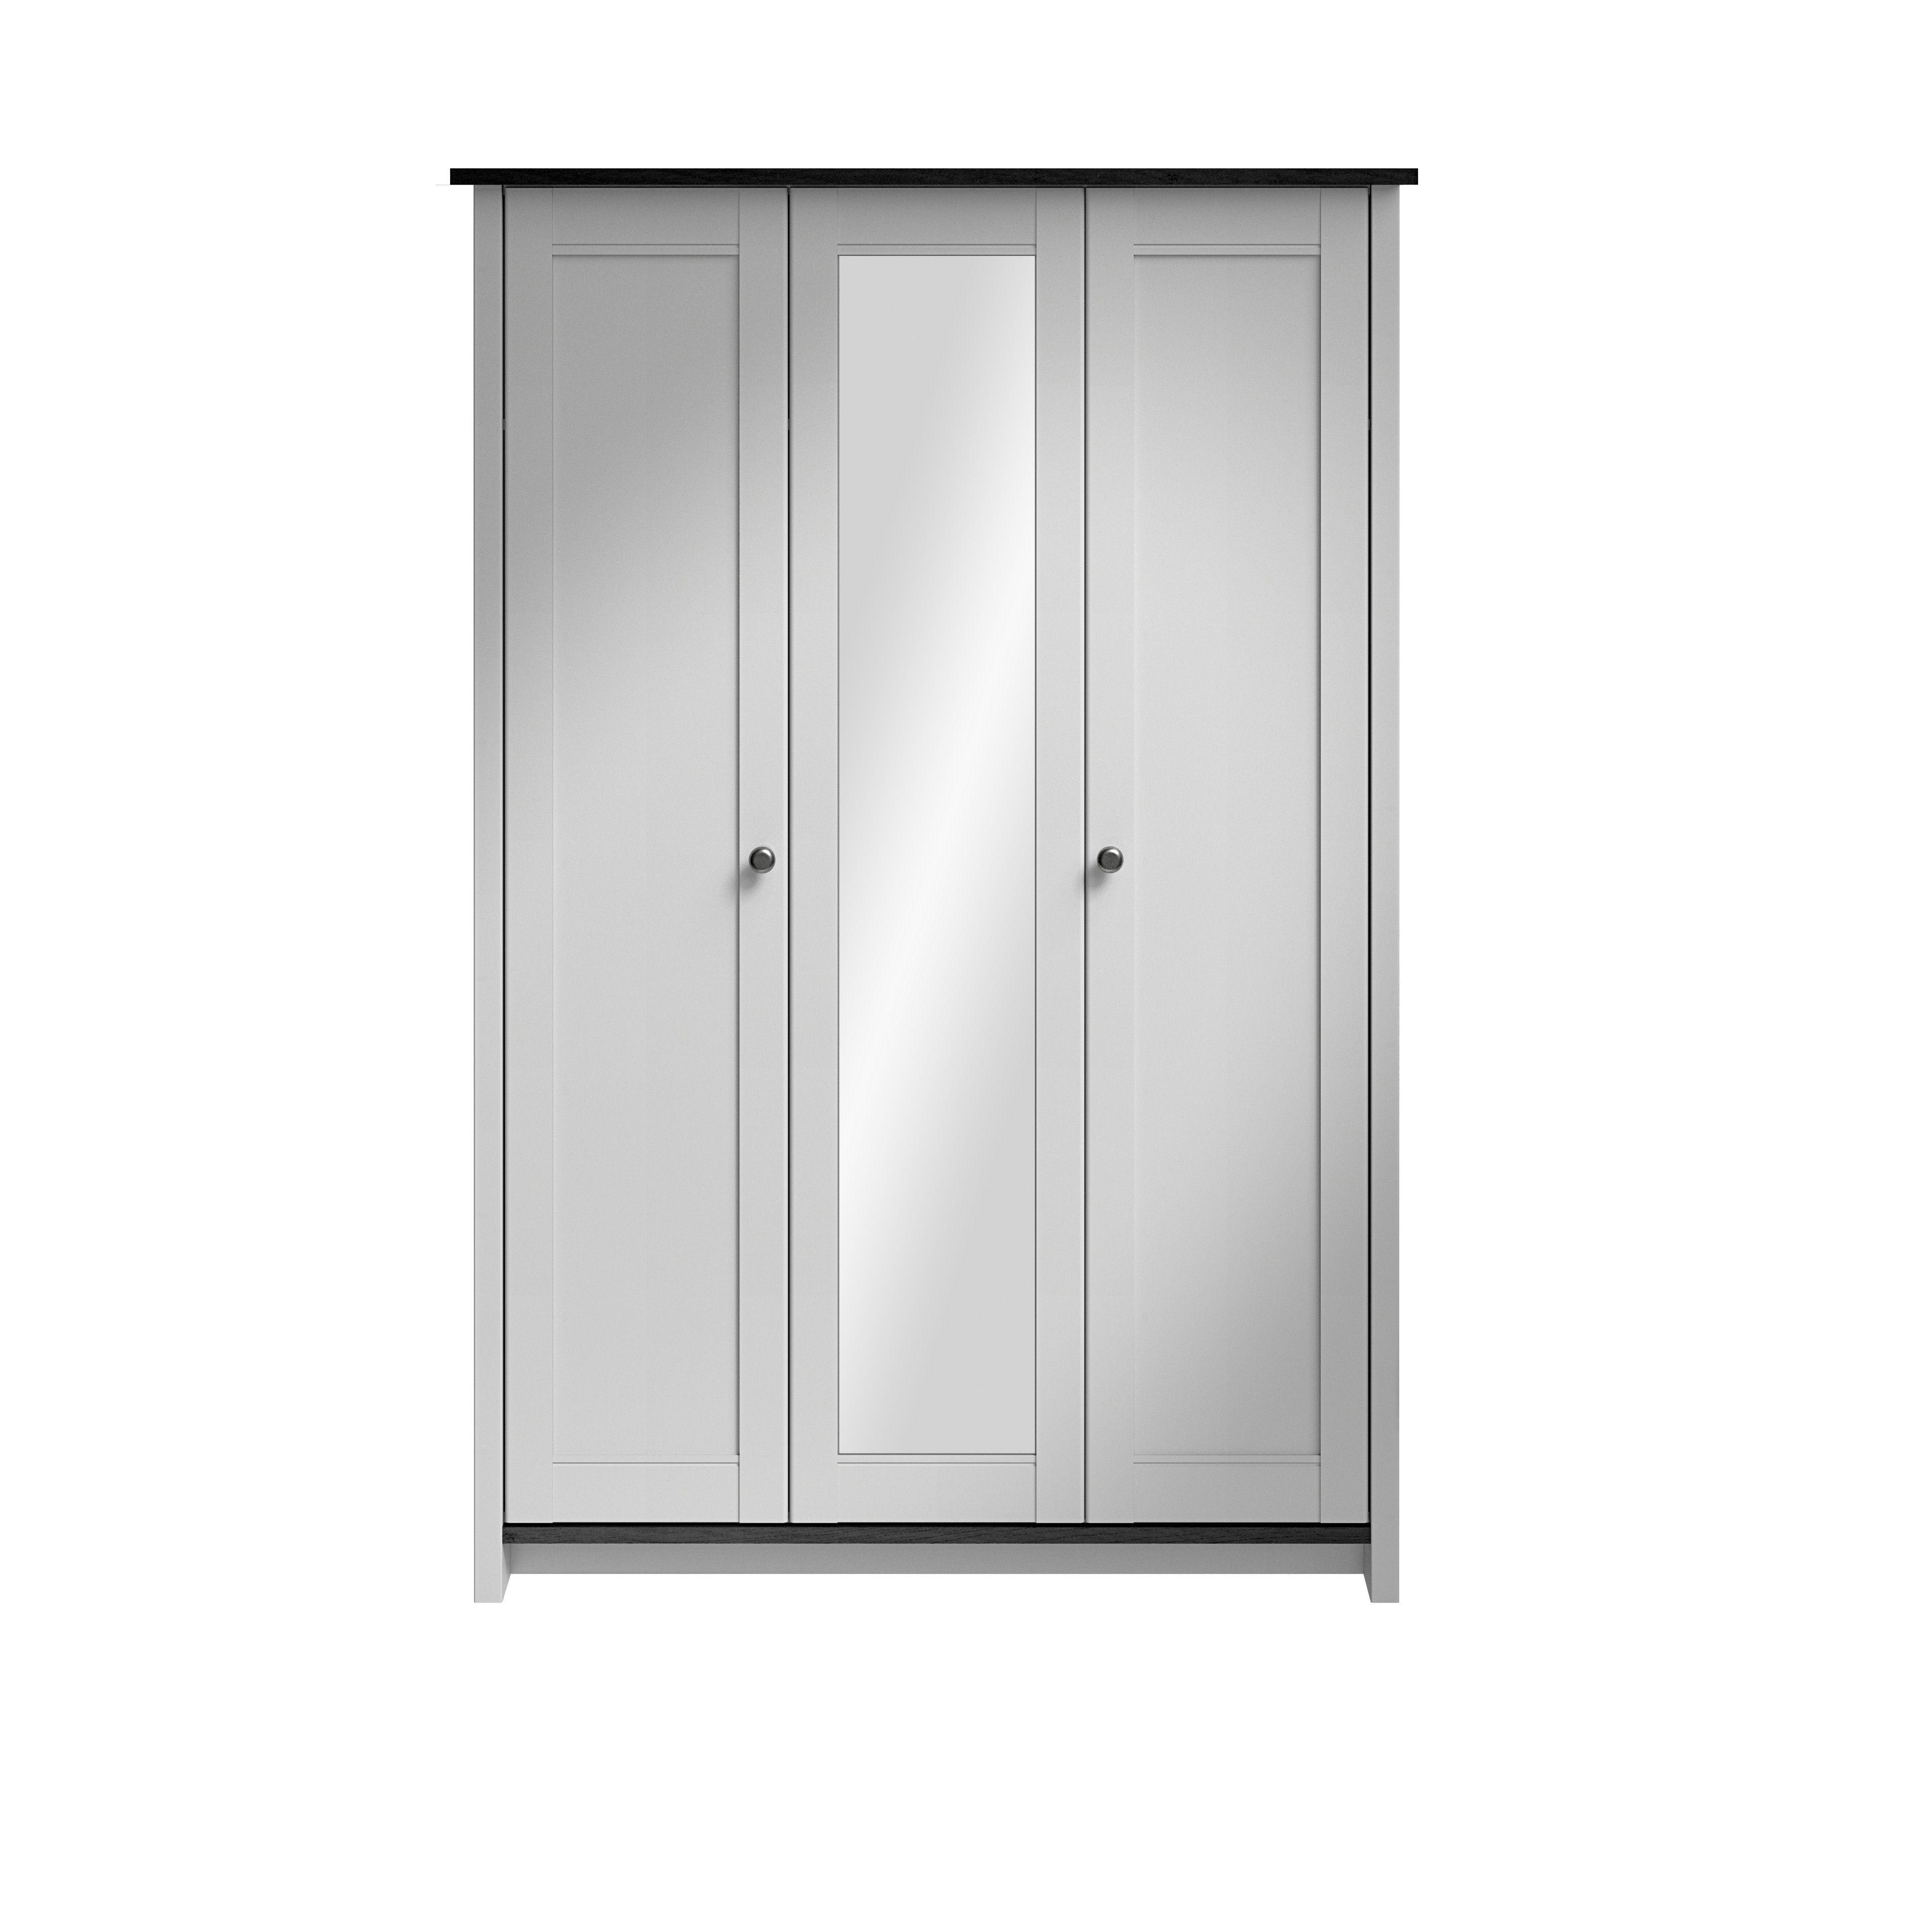 mirror wardrobe. manor grey \u0026 dark oak effect 3 door mirror wardrobe (h)1930mm (w)1700mm | departments diy at b\u0026q